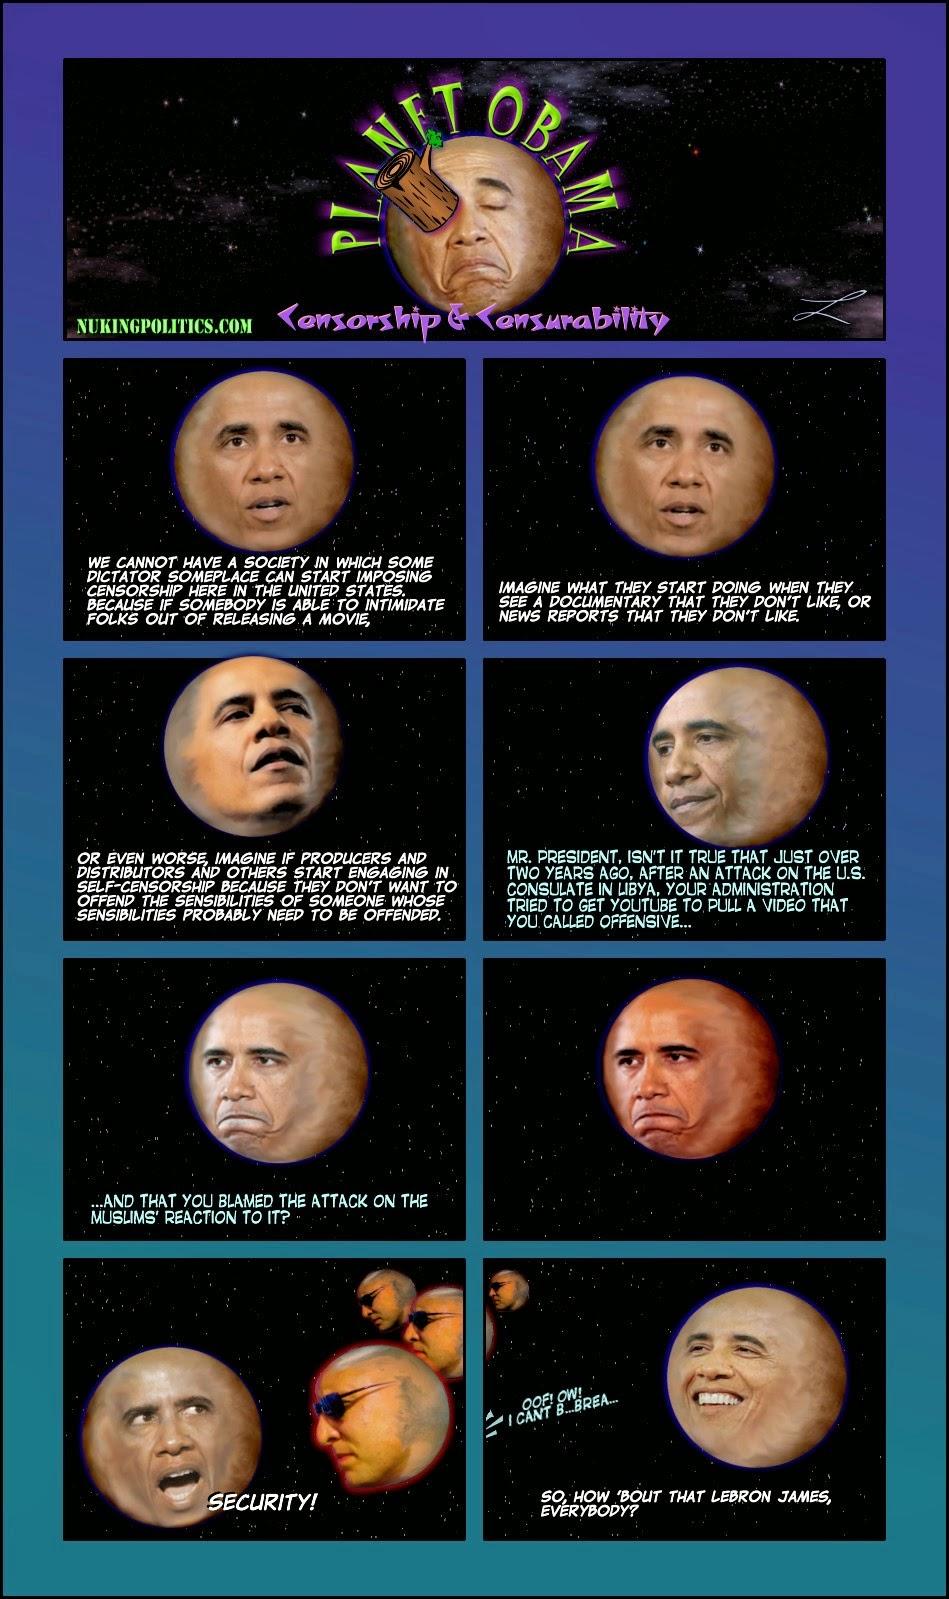 http://www.nukingpolitics.com/2014/12/planet-obama-censorship-censurability.html